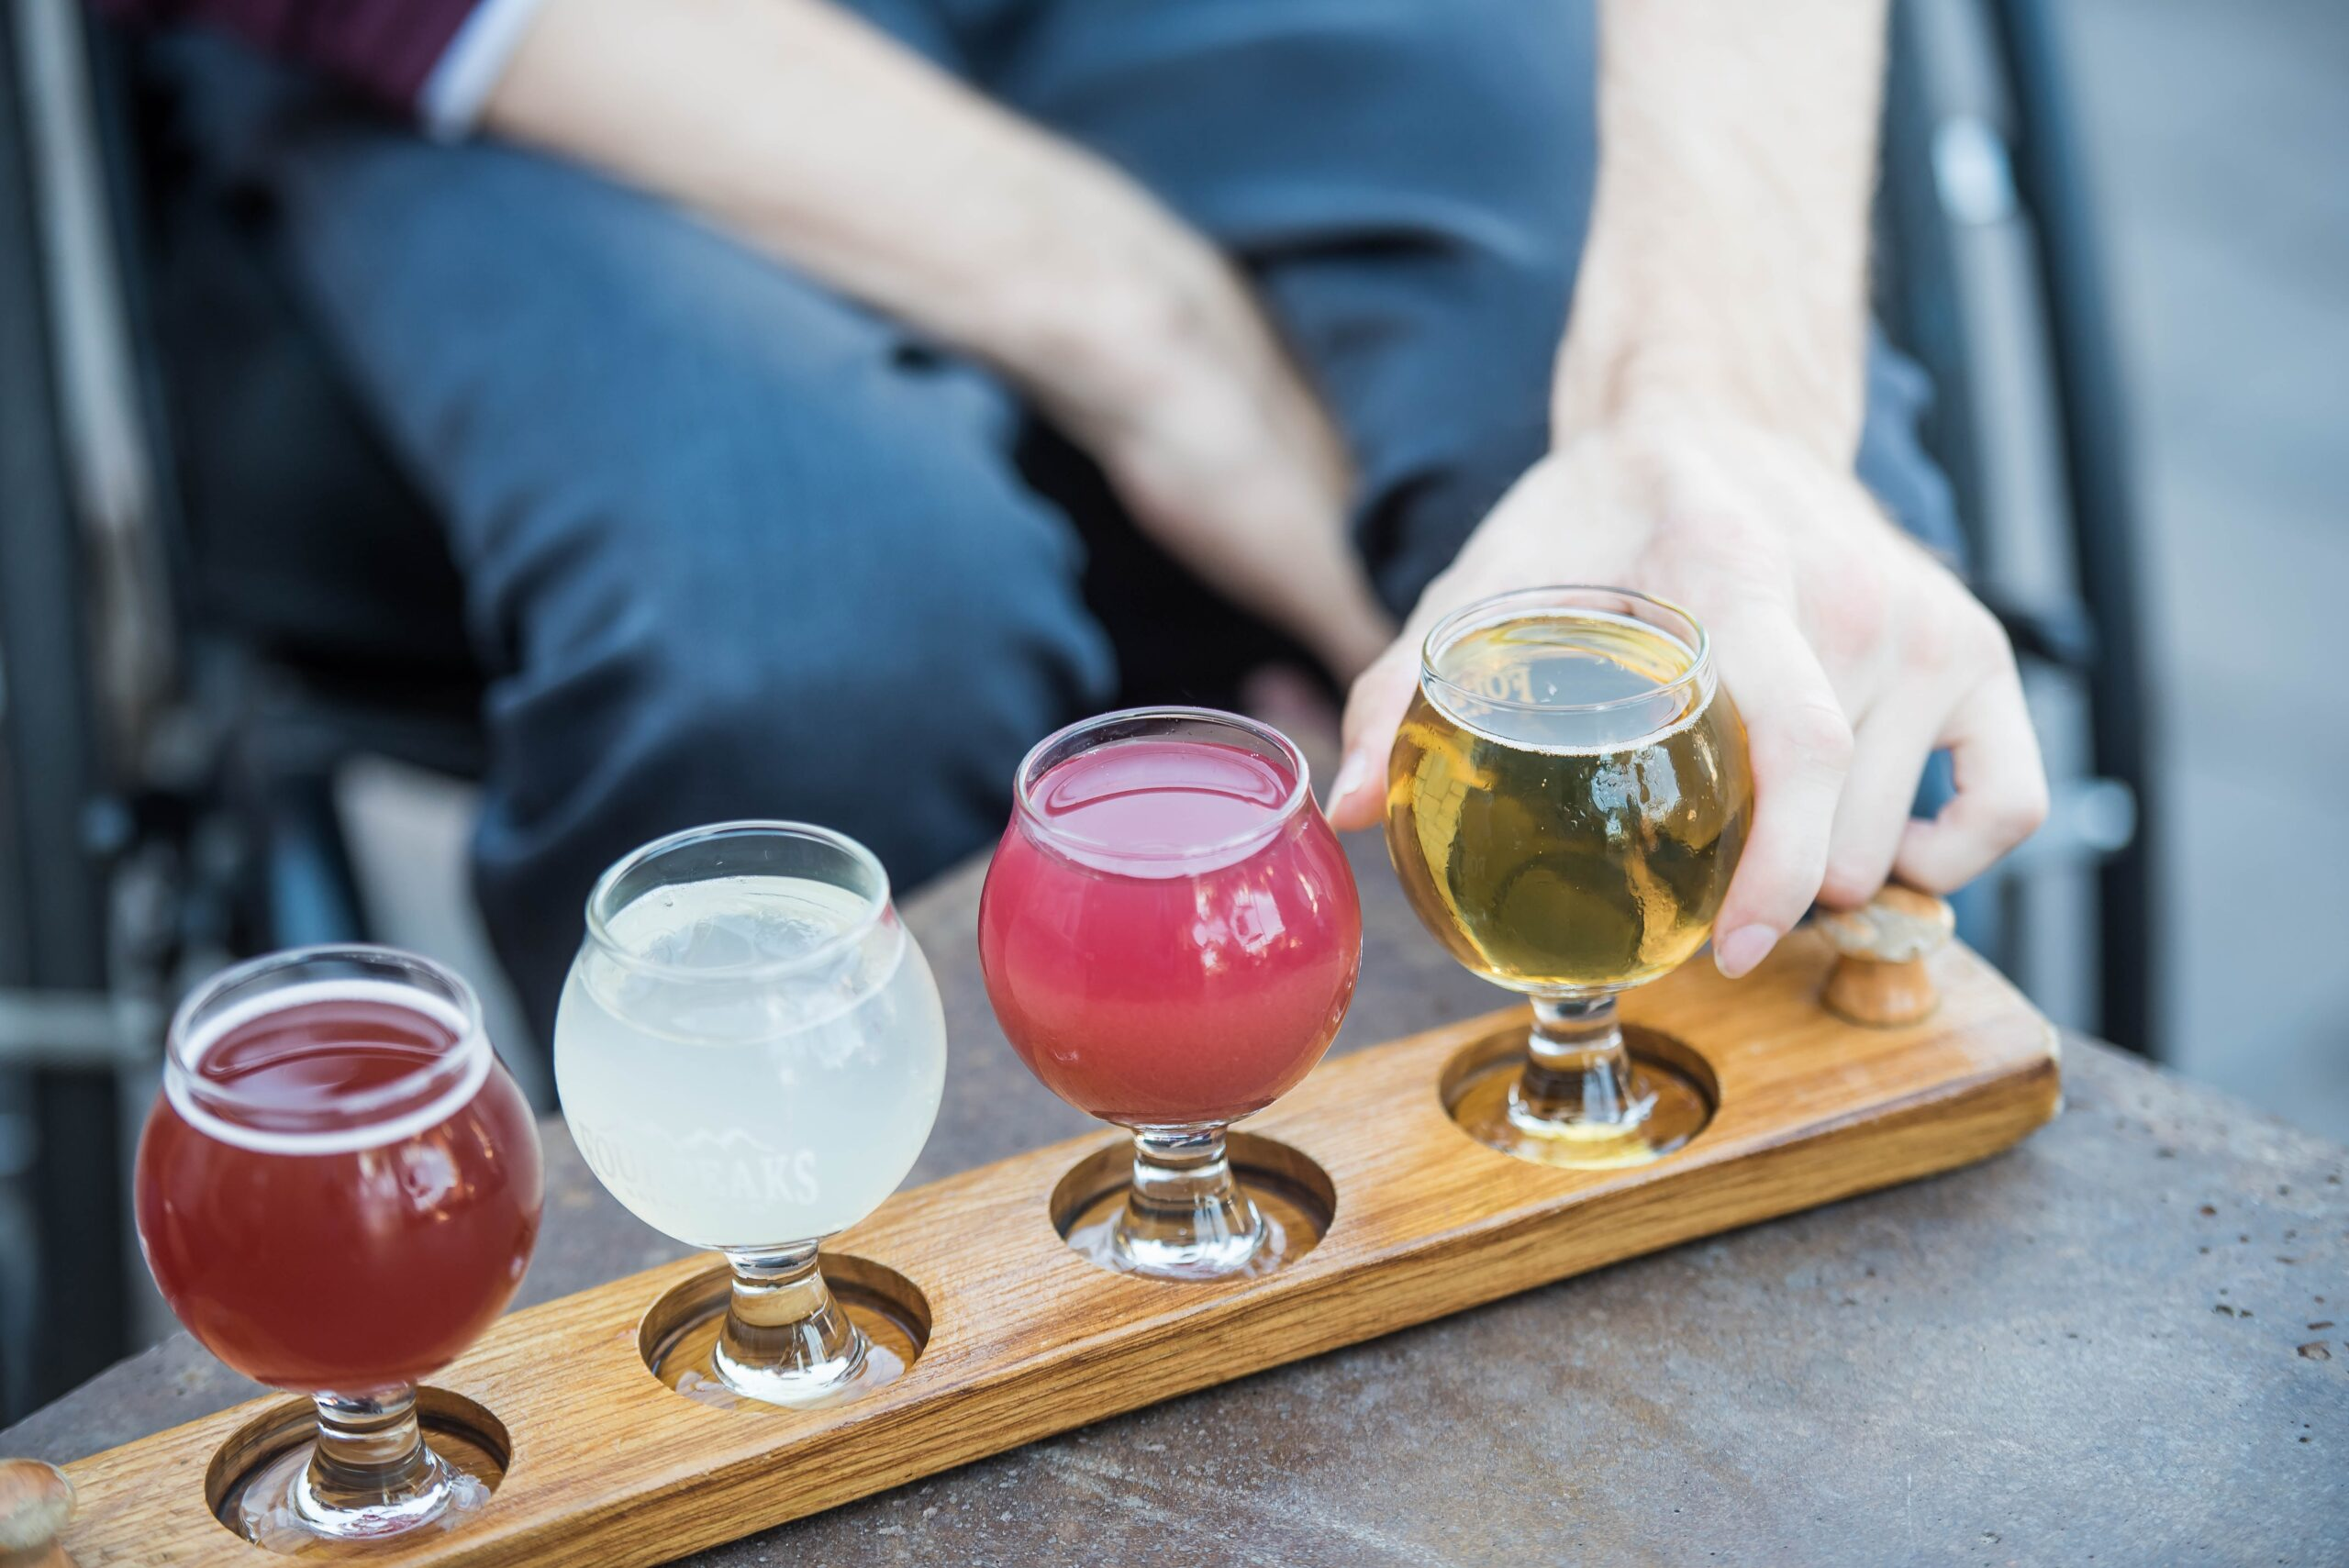 Cerveza Tienda Solana